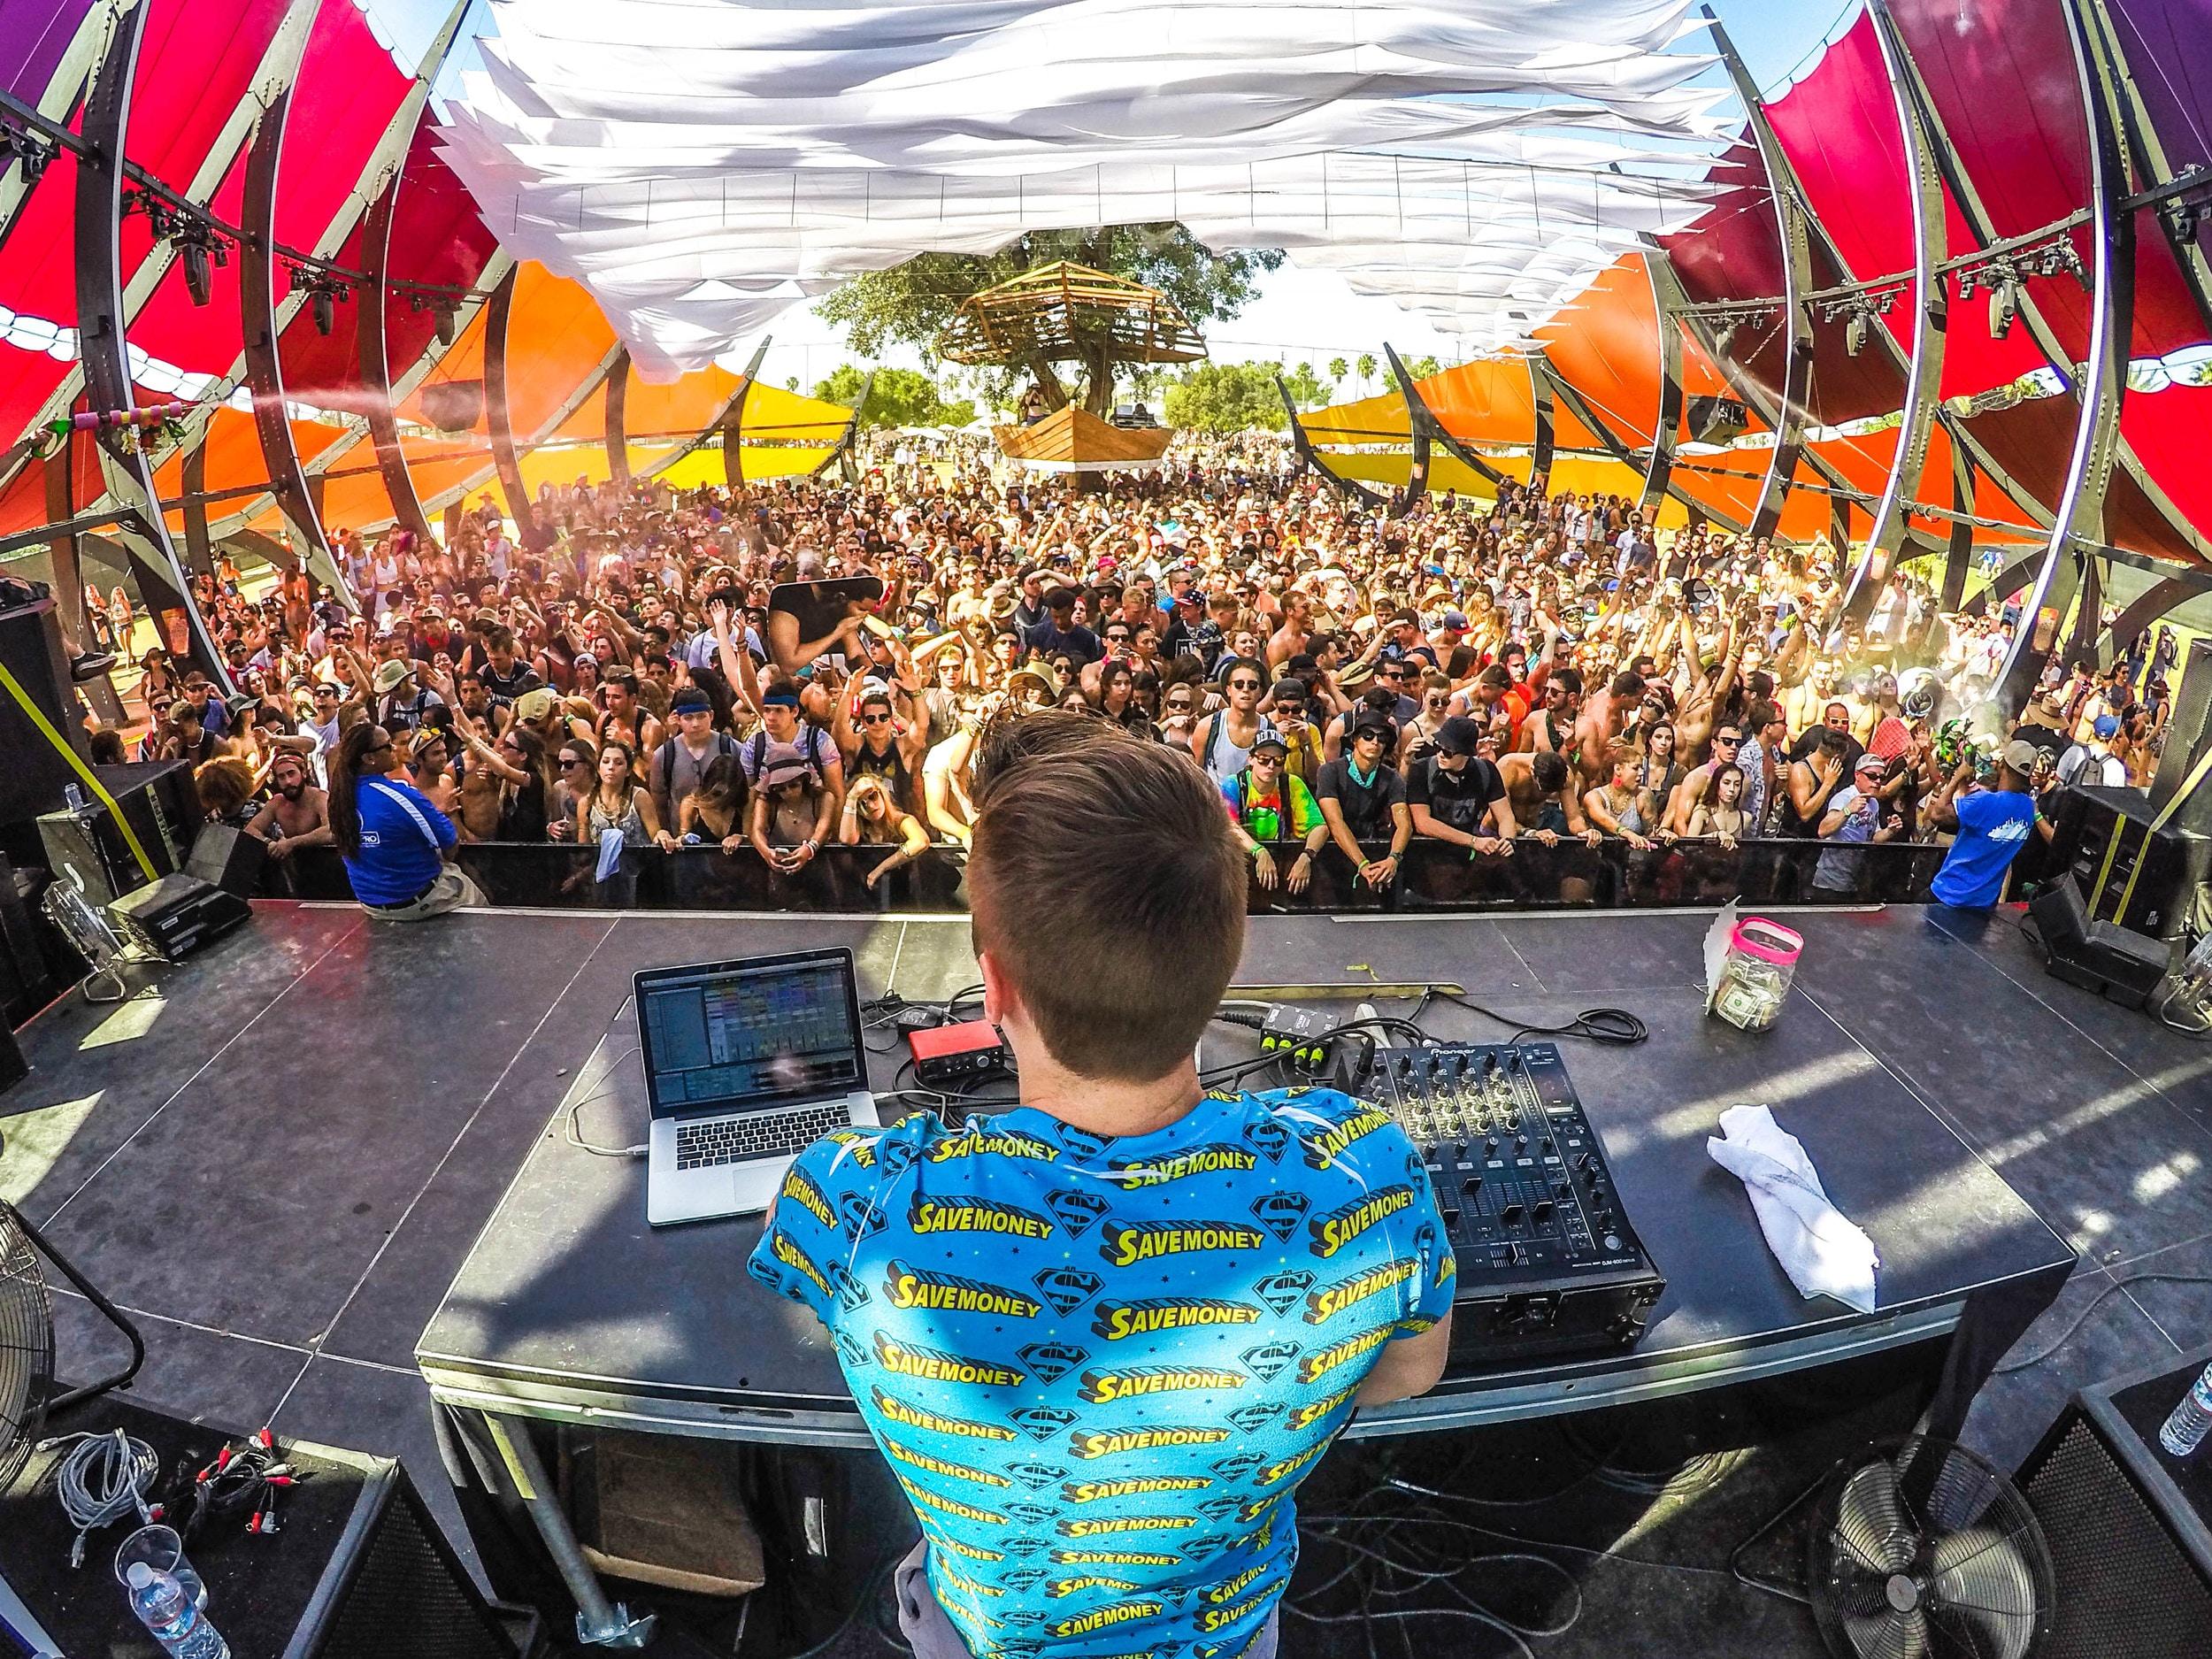 Bunberry Festival 2020.Top 10 Summer Music Festivals That Beat Coachella College